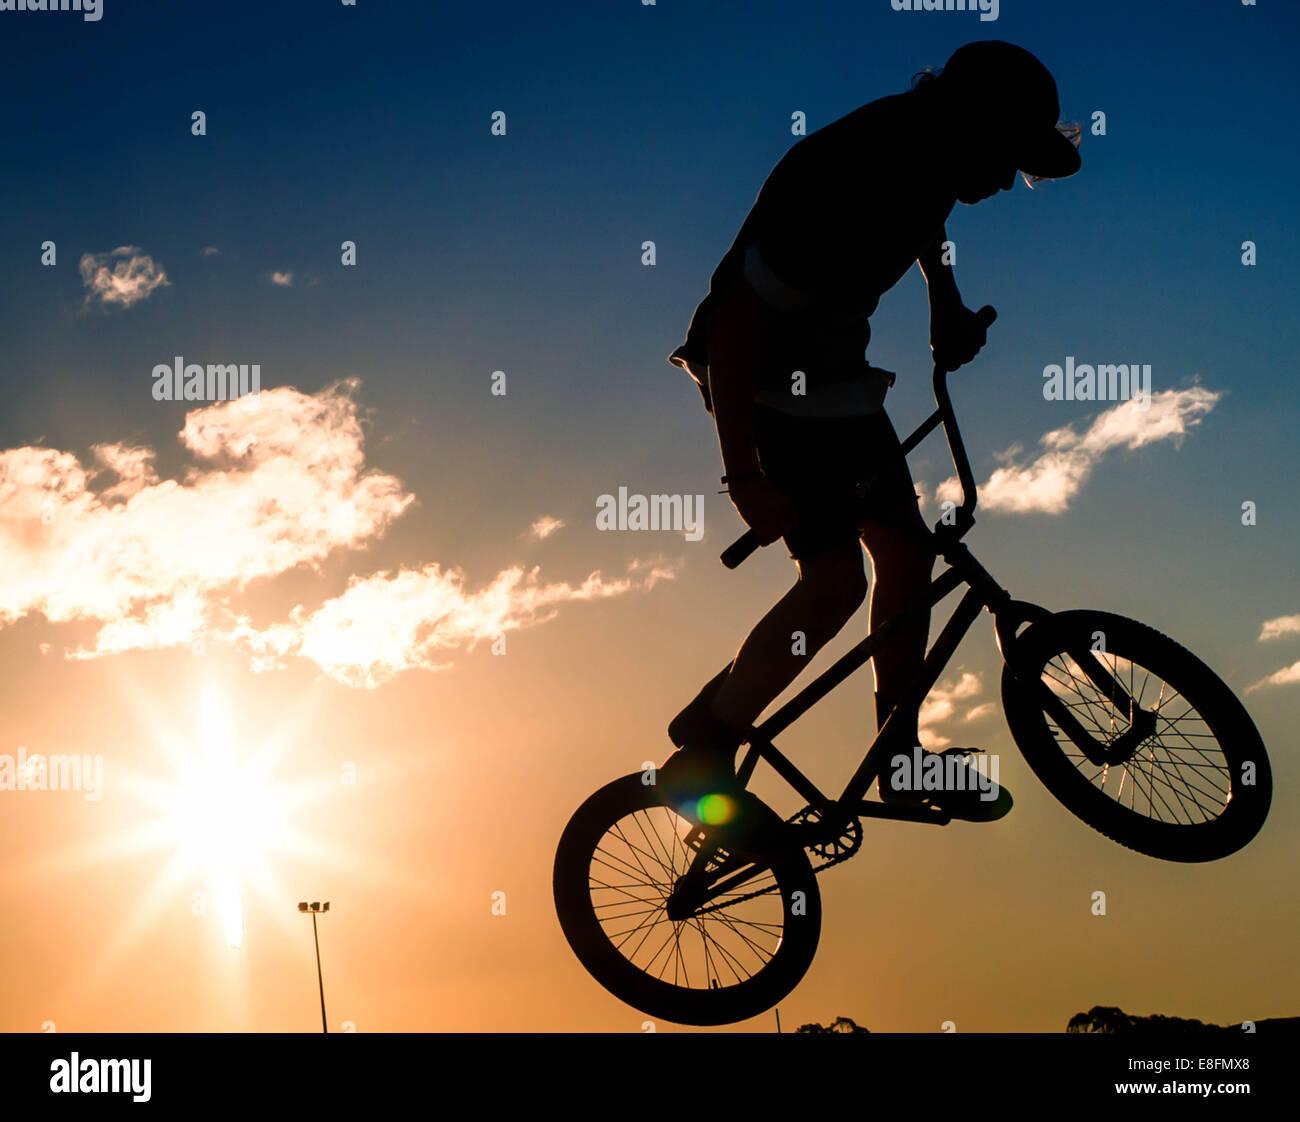 Silhouette of boy doing stunts on his bmx bike - Stock Image